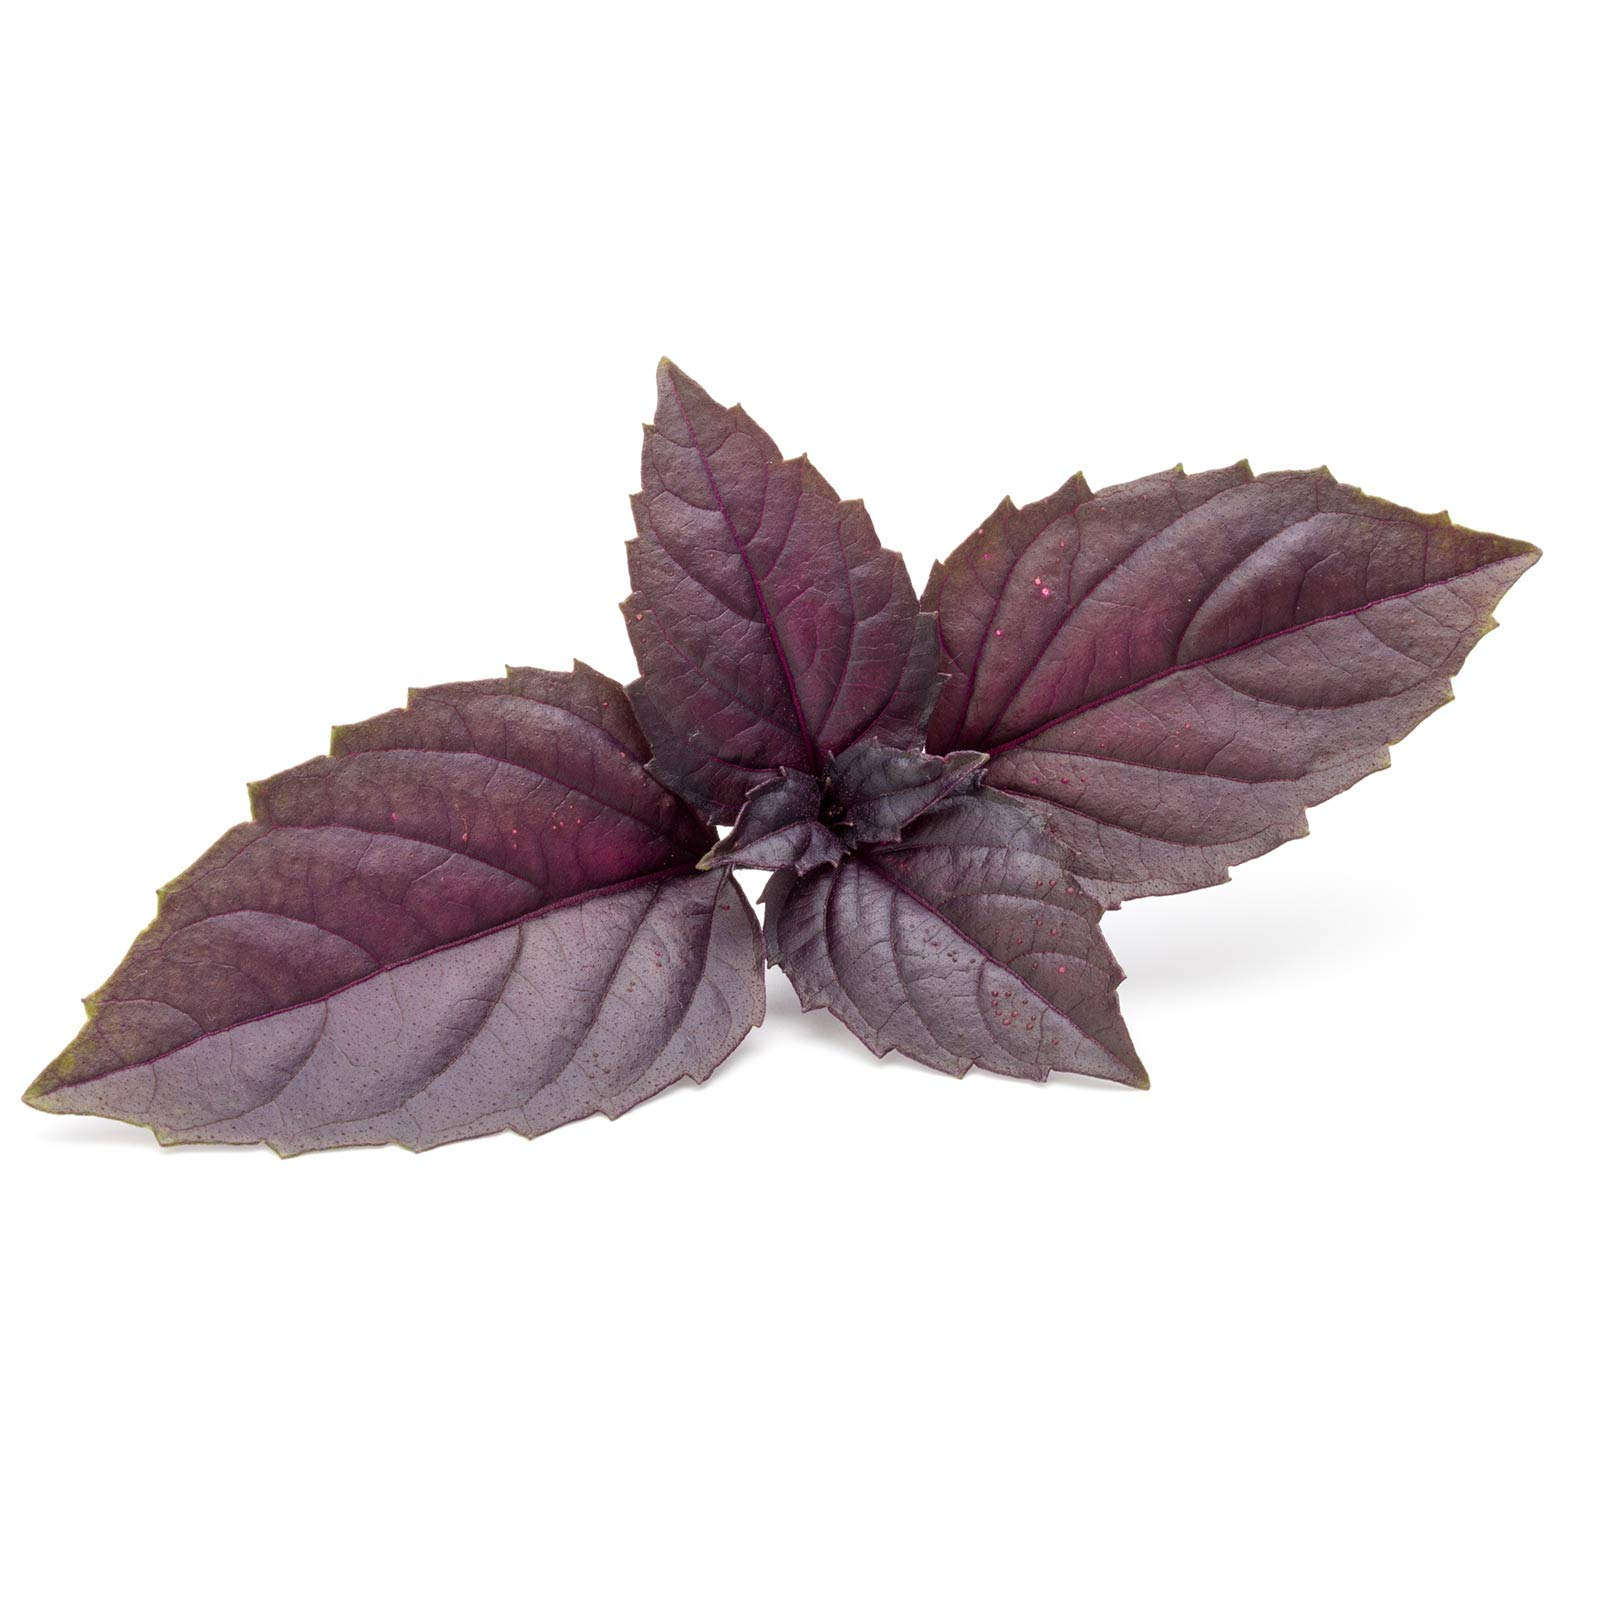 Basil Herb Garden Seeds - Red Rubin - 5 Lb - Non-GMO Herbal Gardening & Microgreens Seeds